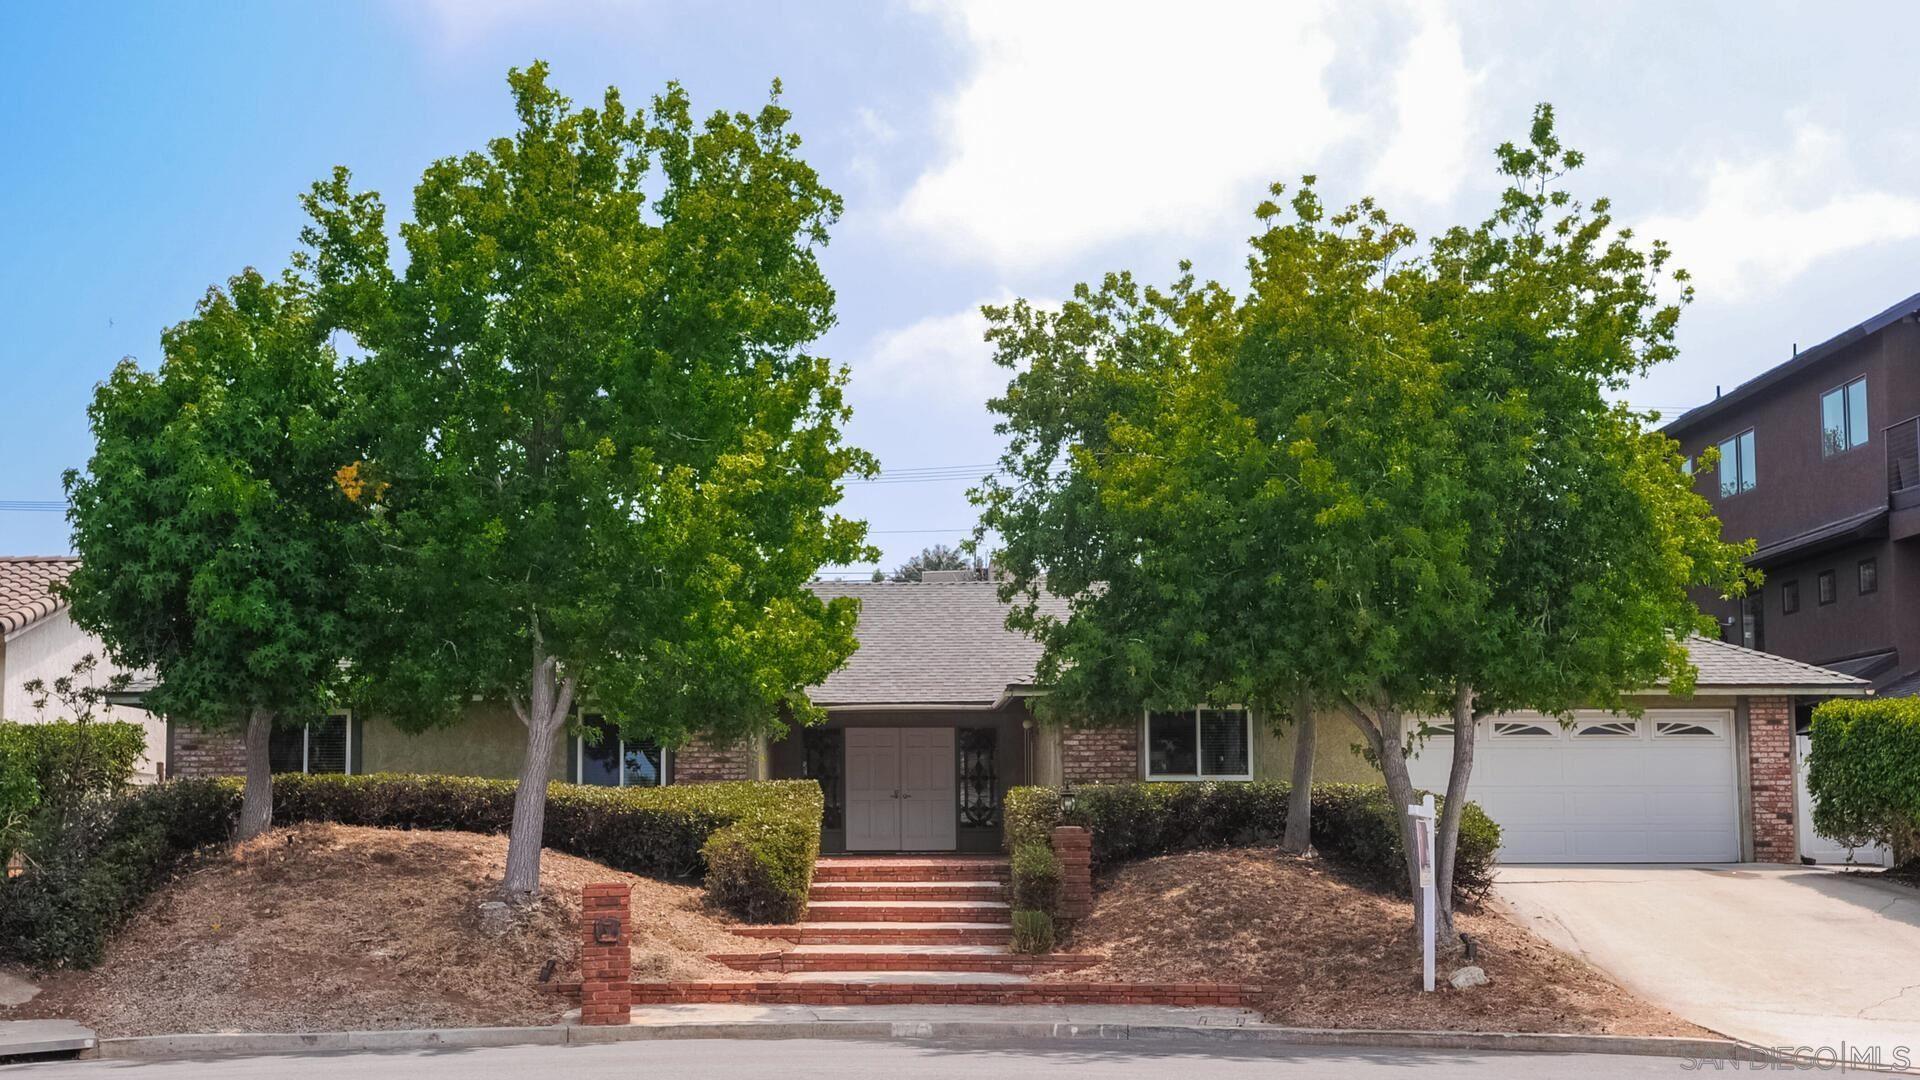 Photo of 1770 Terraza St, Oceanside, CA 92054 (MLS # 210020106)